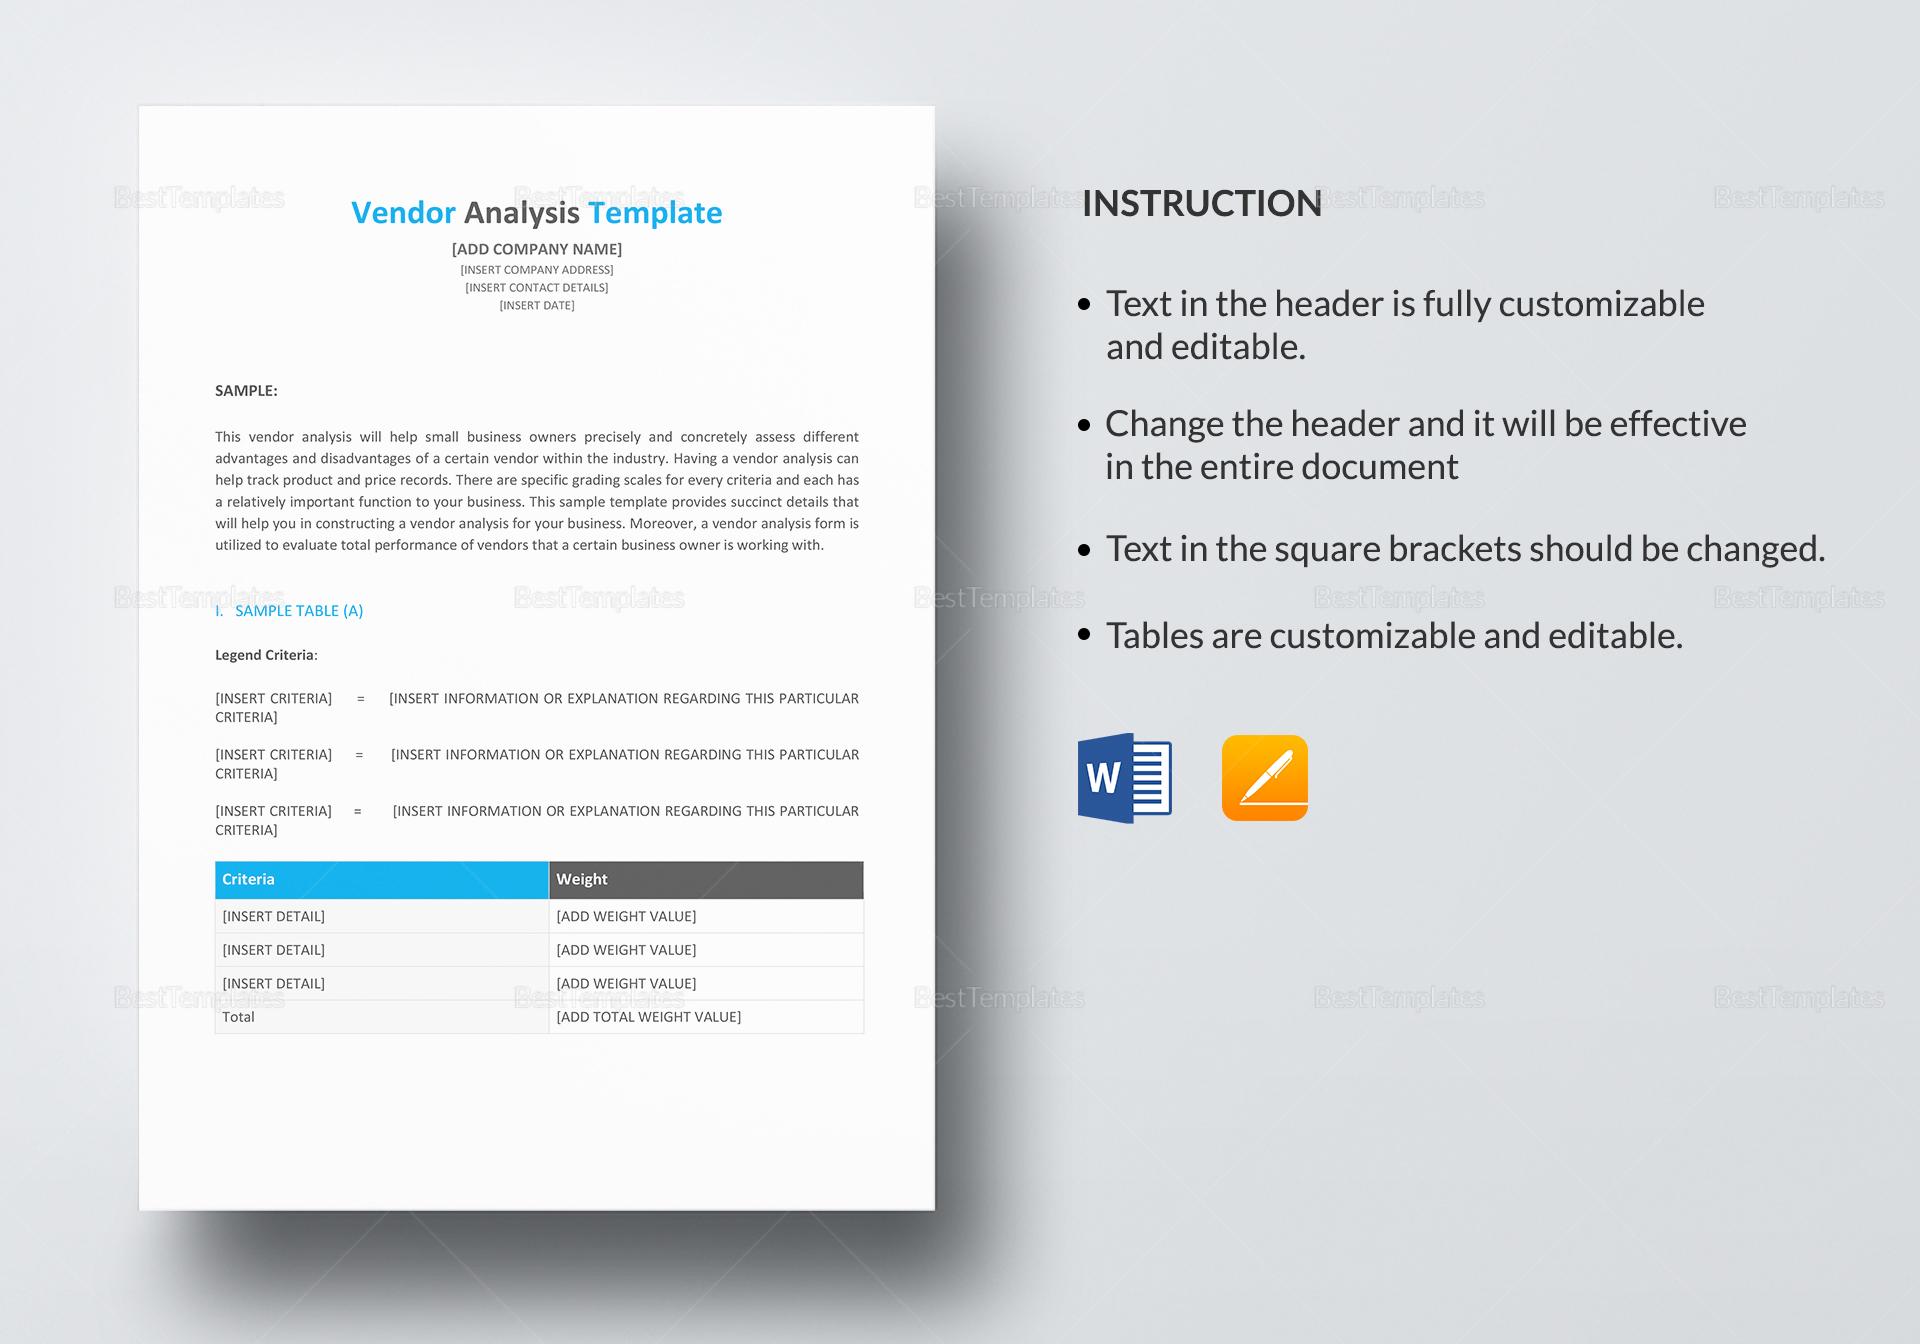 Vendor Analysis Template; Vendor Analysis Template; Vendor Analysis Template